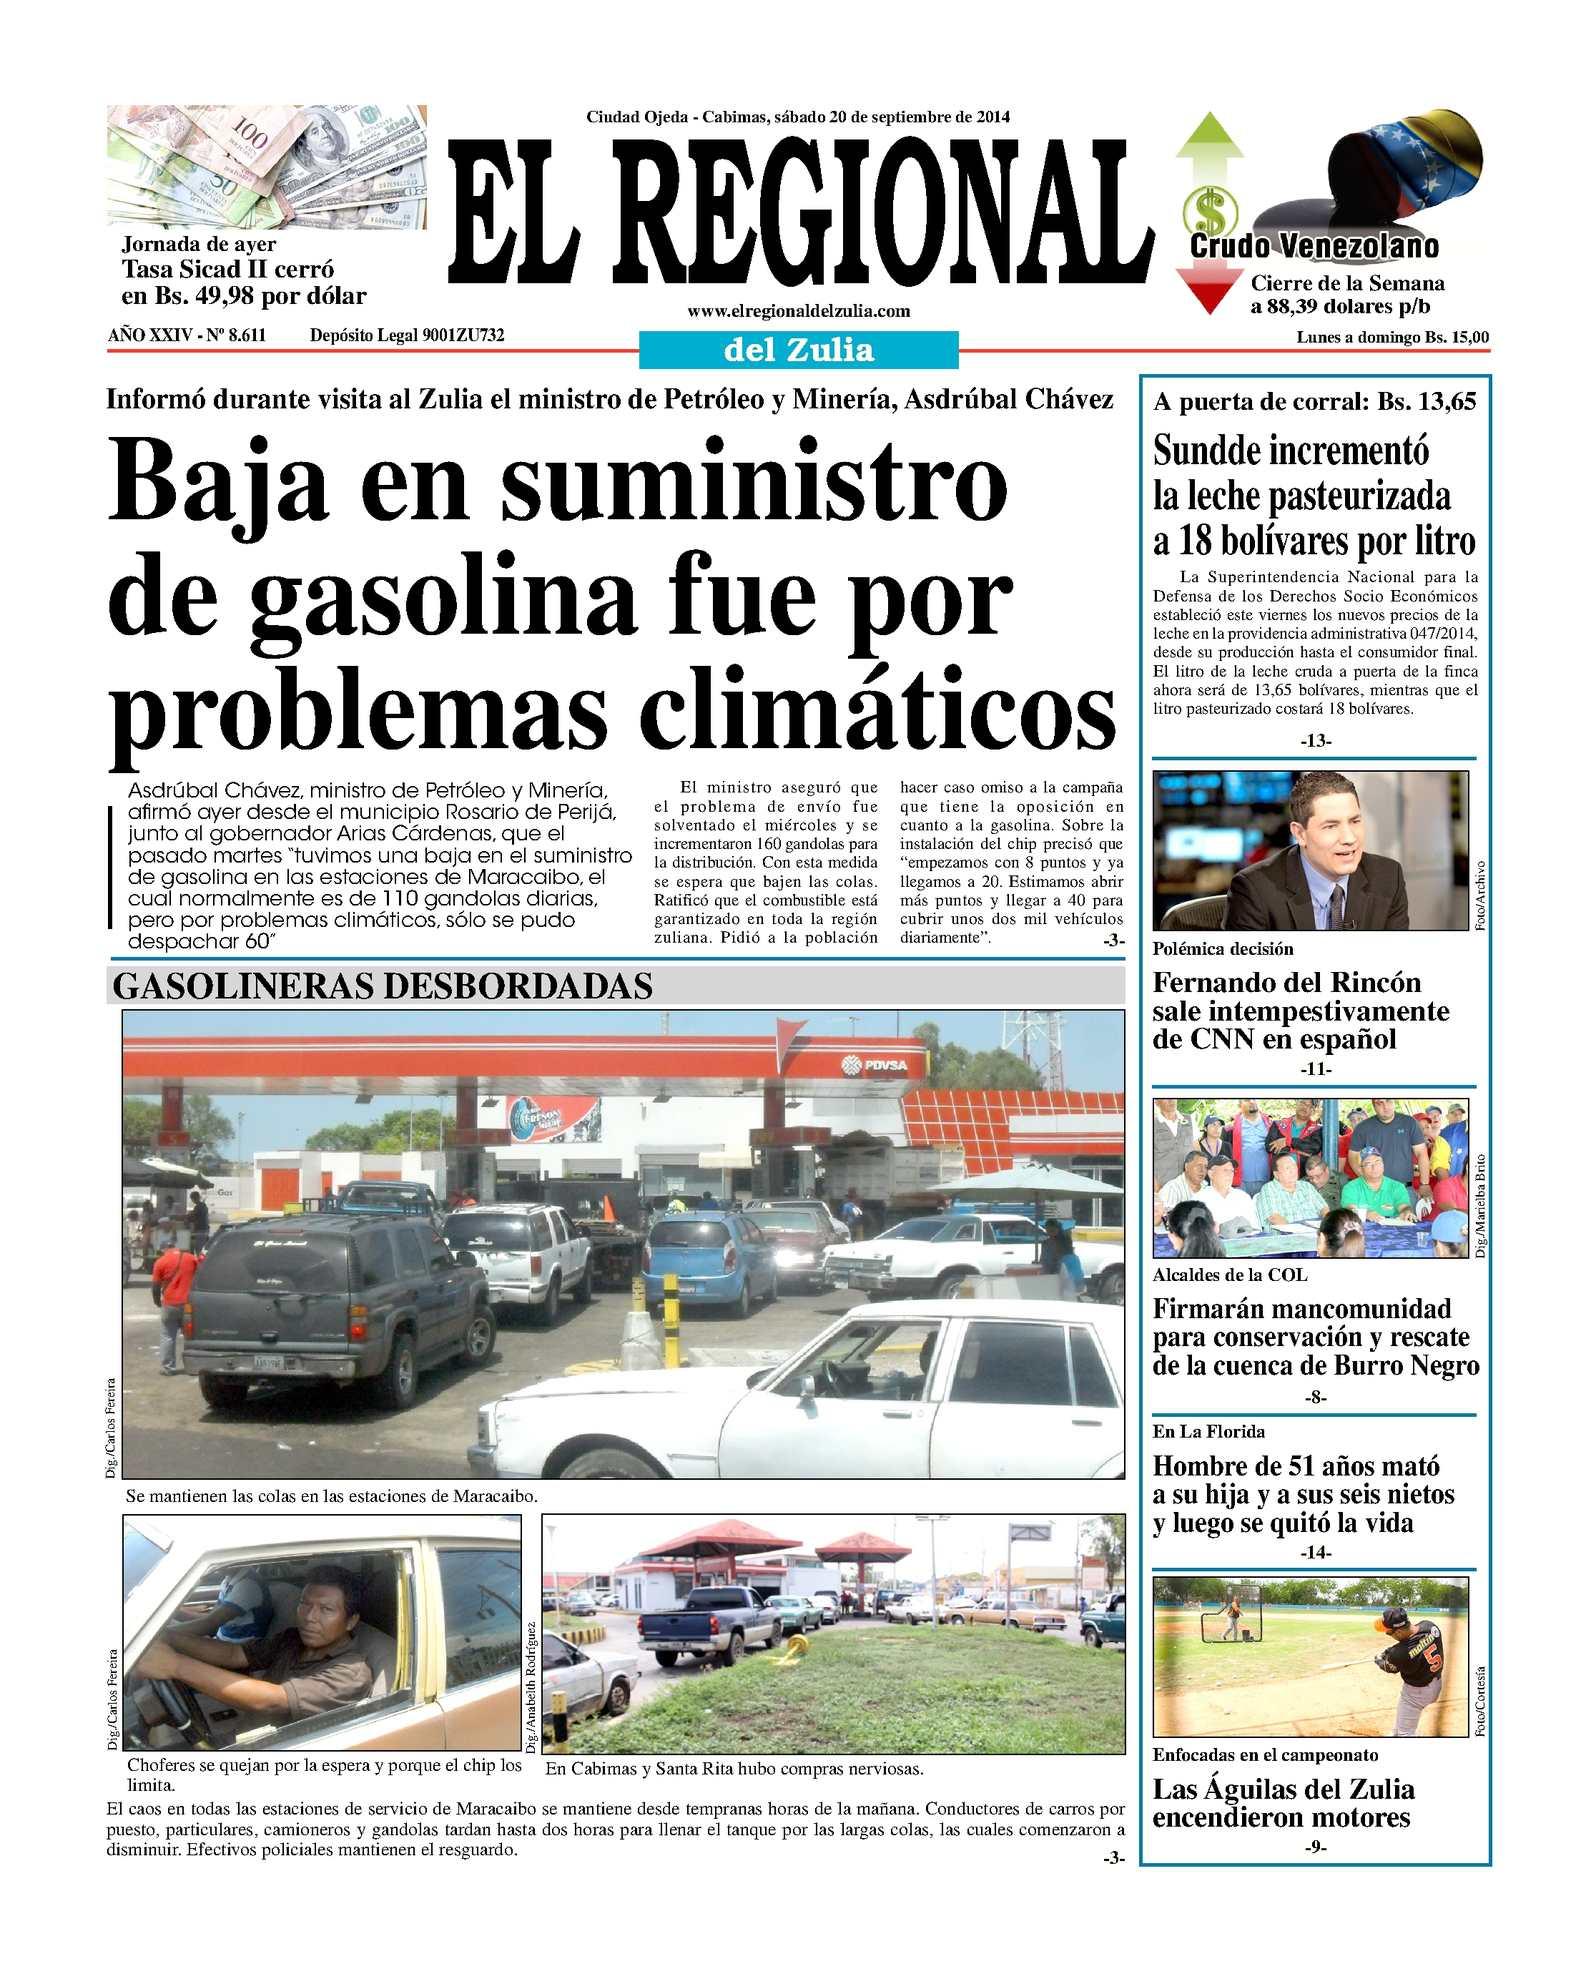 Calaméo - El Regional del Zulia 20-09-2014